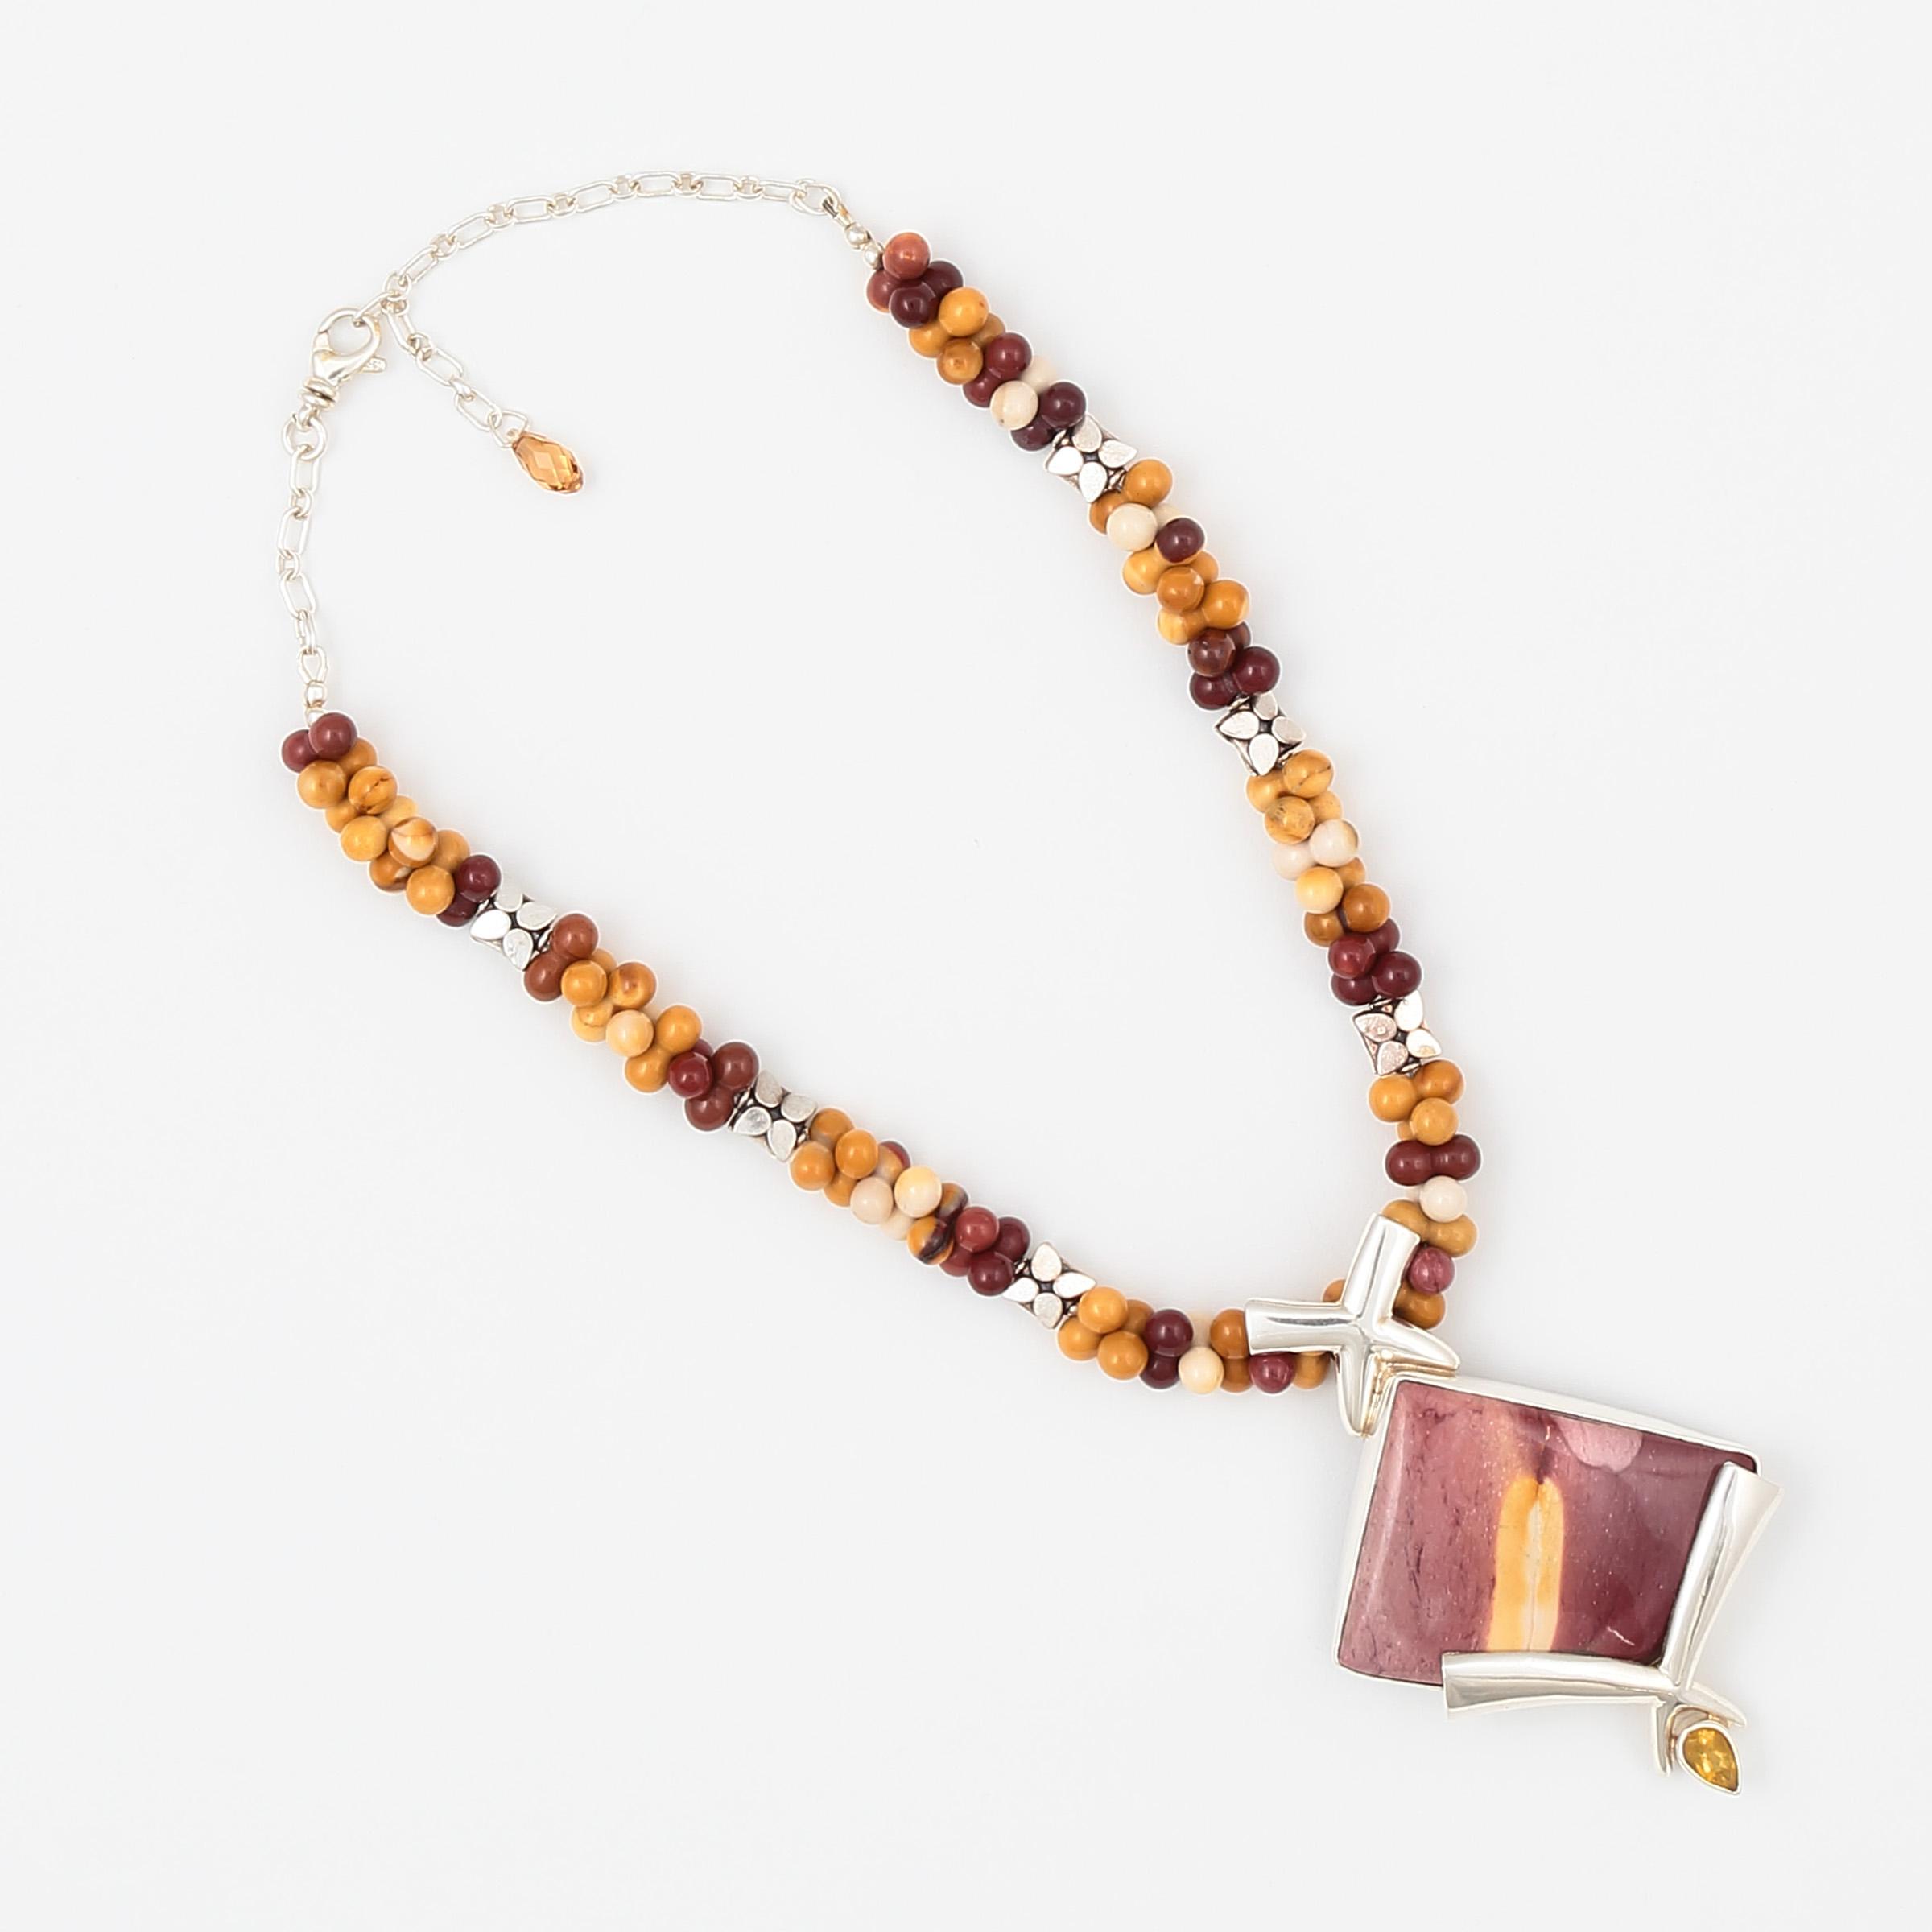 Courage Necklace – Semi Precious Stones & Sterling Silver